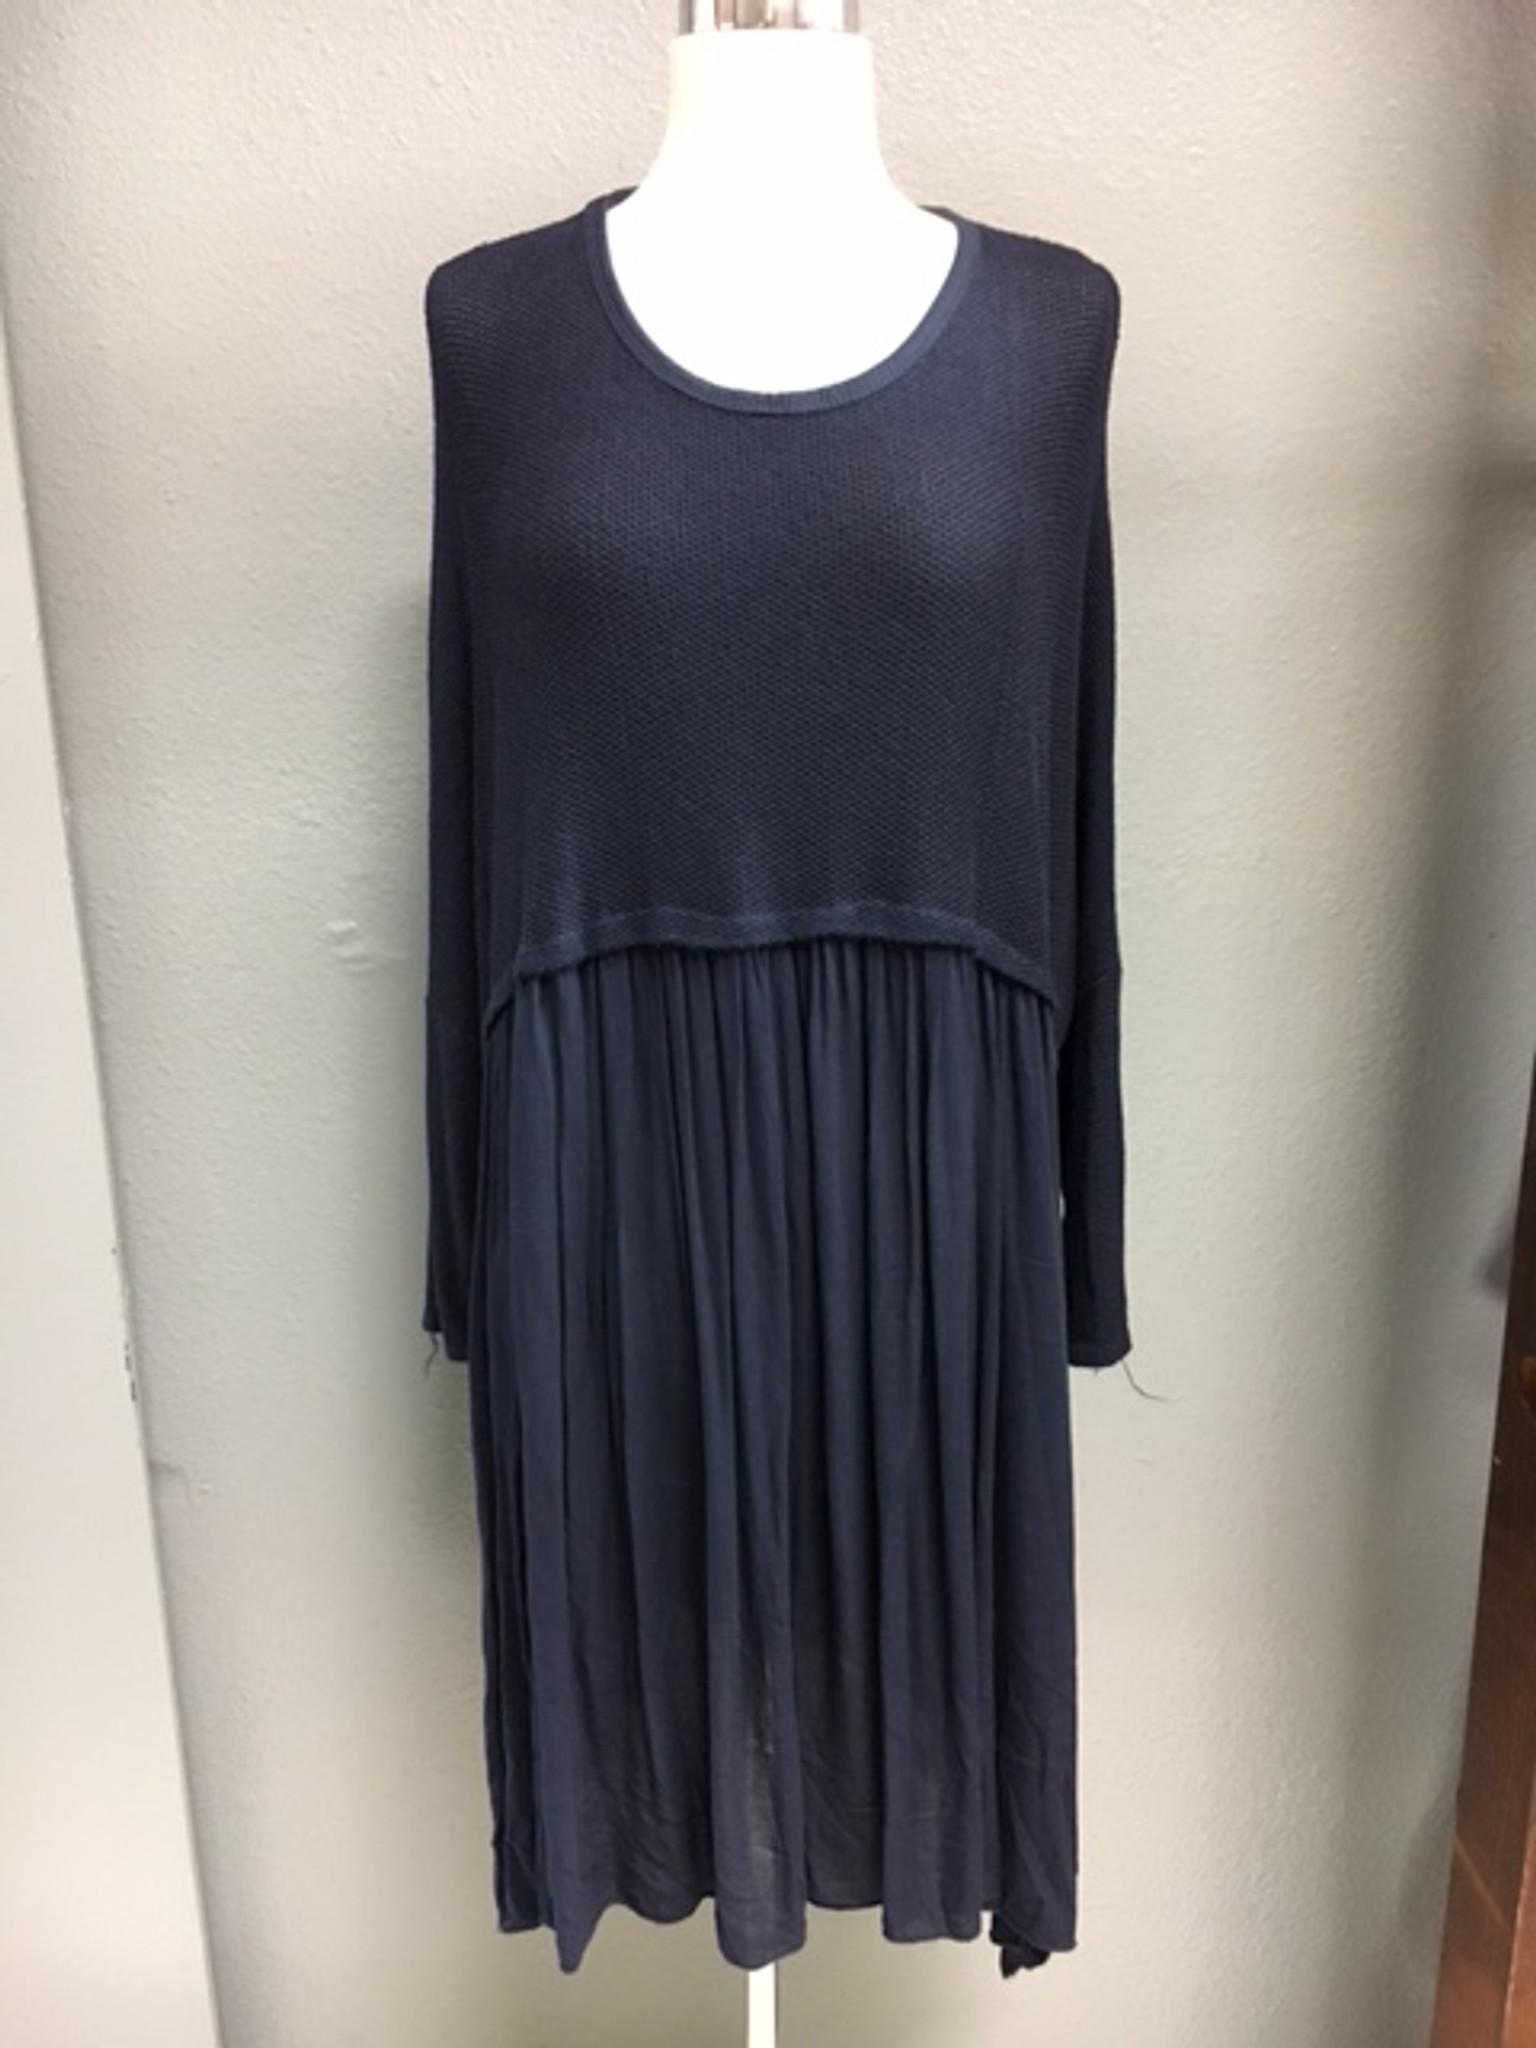 Dolman Sleeve Scoot Neck Tunic or Dress